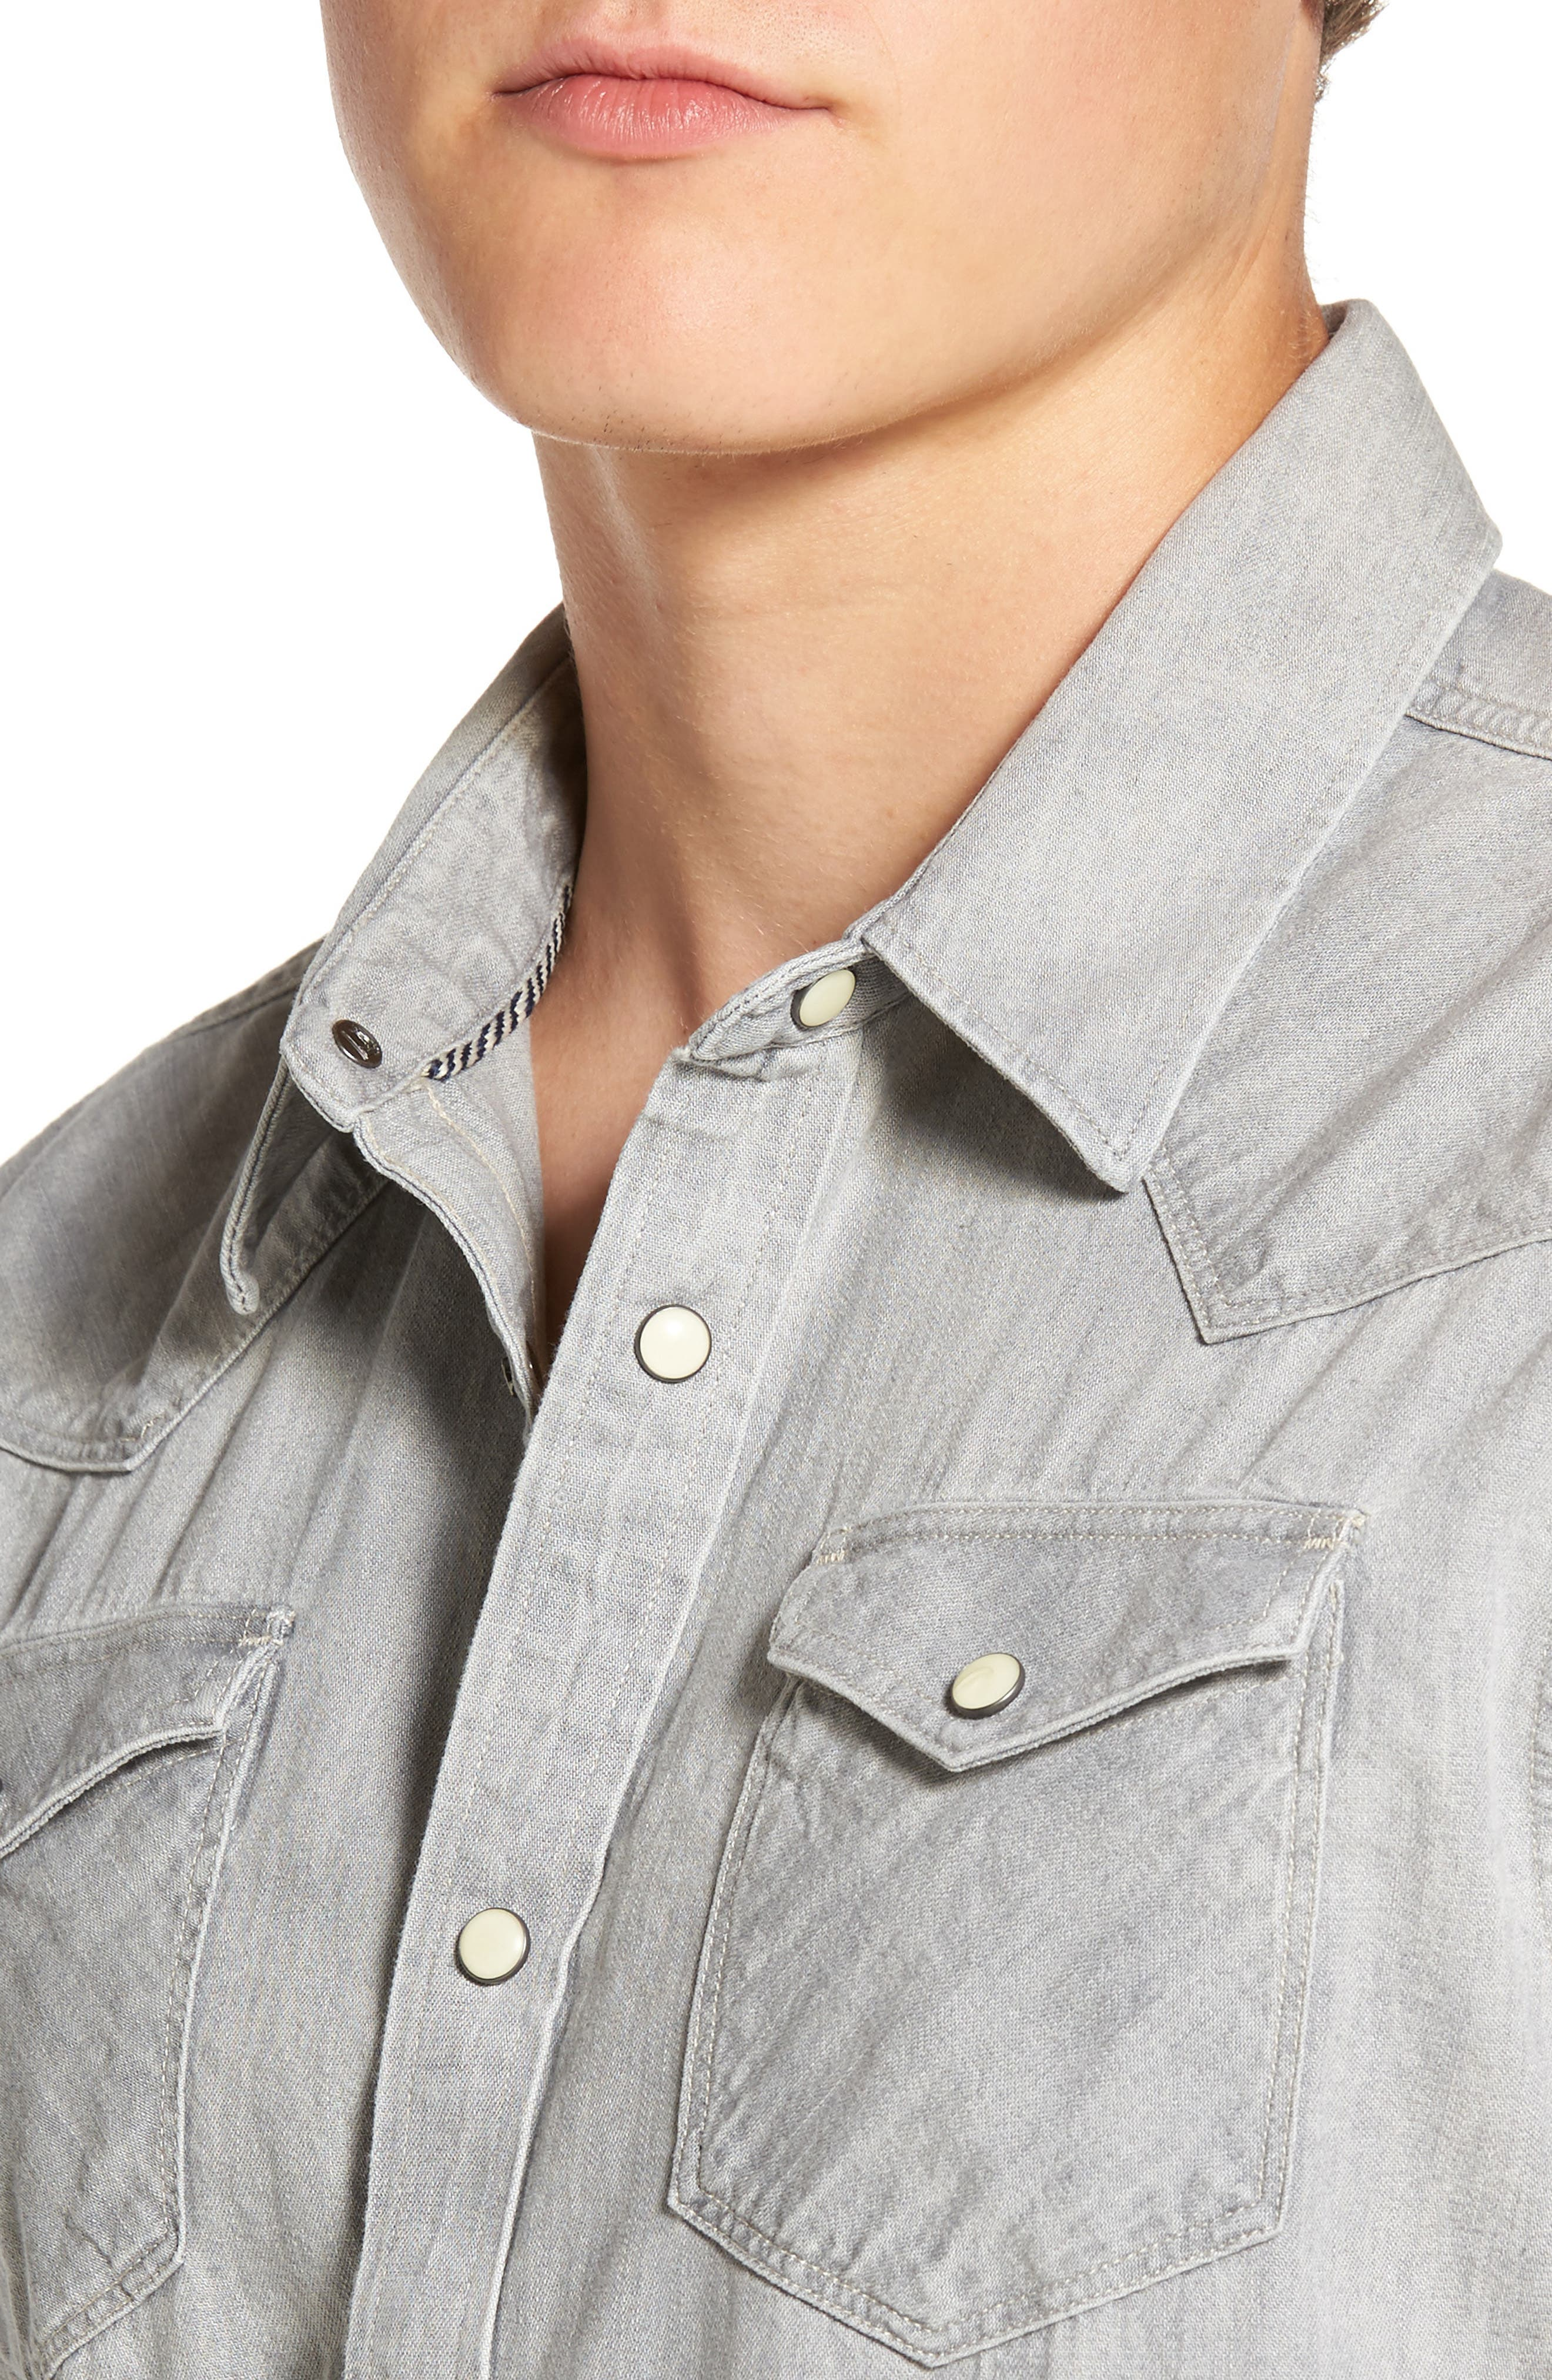 Western Shirt,                             Alternate thumbnail 4, color,                             040